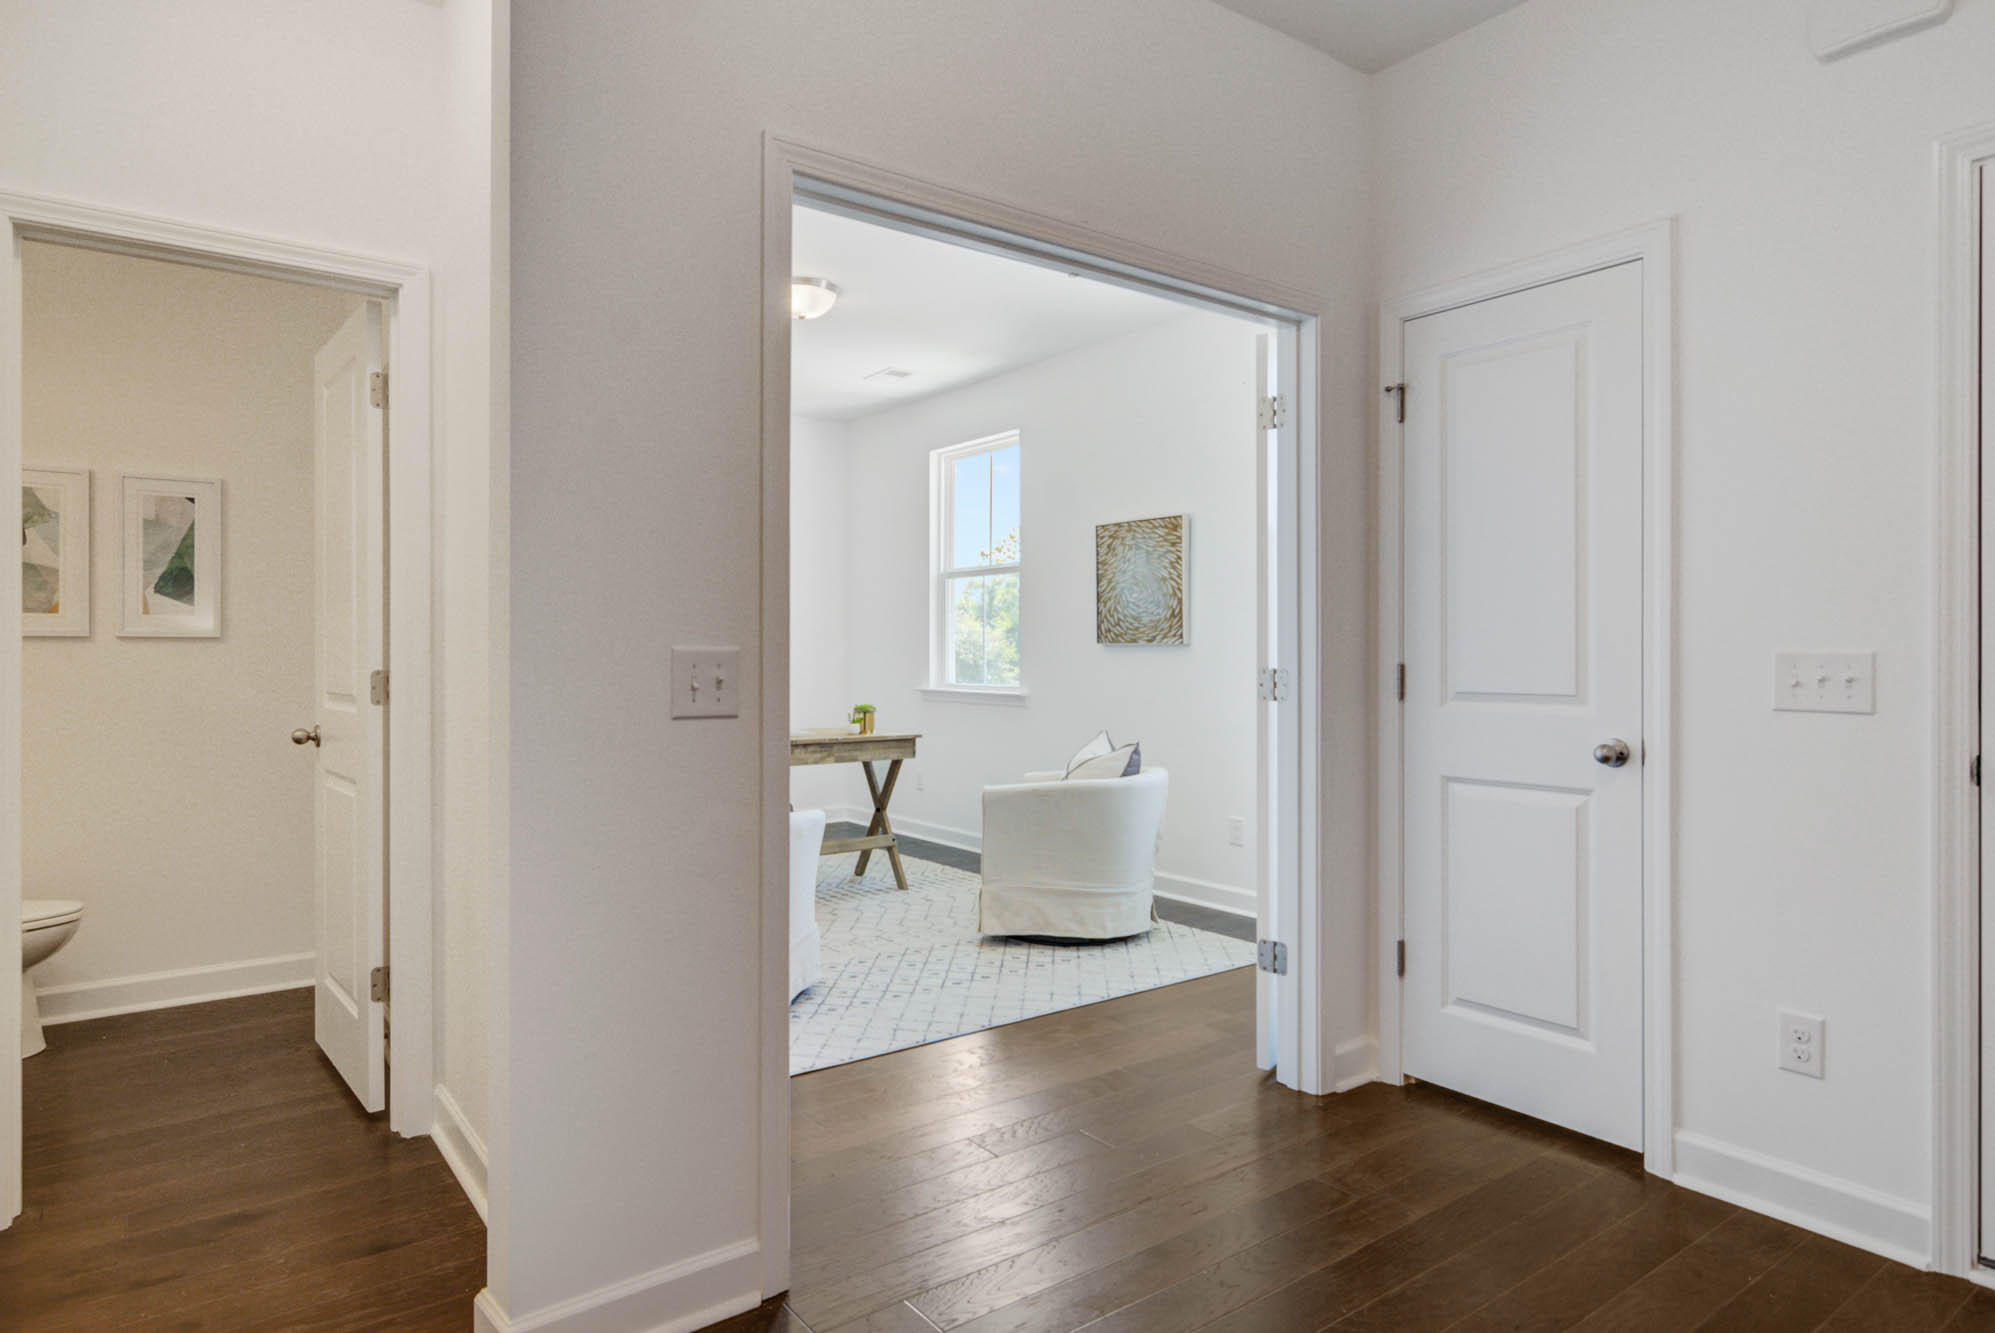 Marshview Commons Homes For Sale - 530 Mclernon, Johns Island, SC - 29